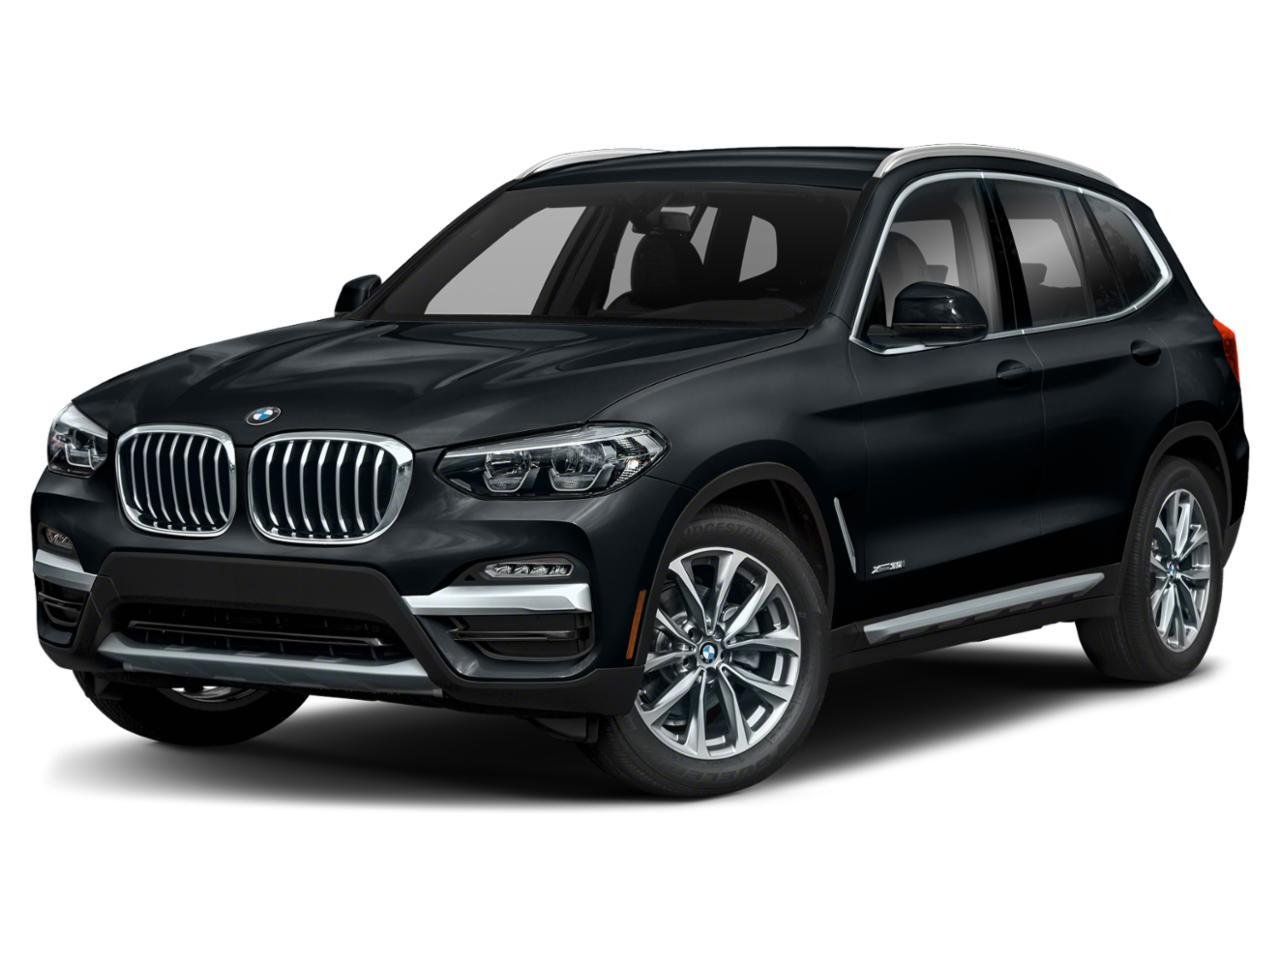 2019 BMW X3 M40i Vehicle Photo in Charleston, SC 29407